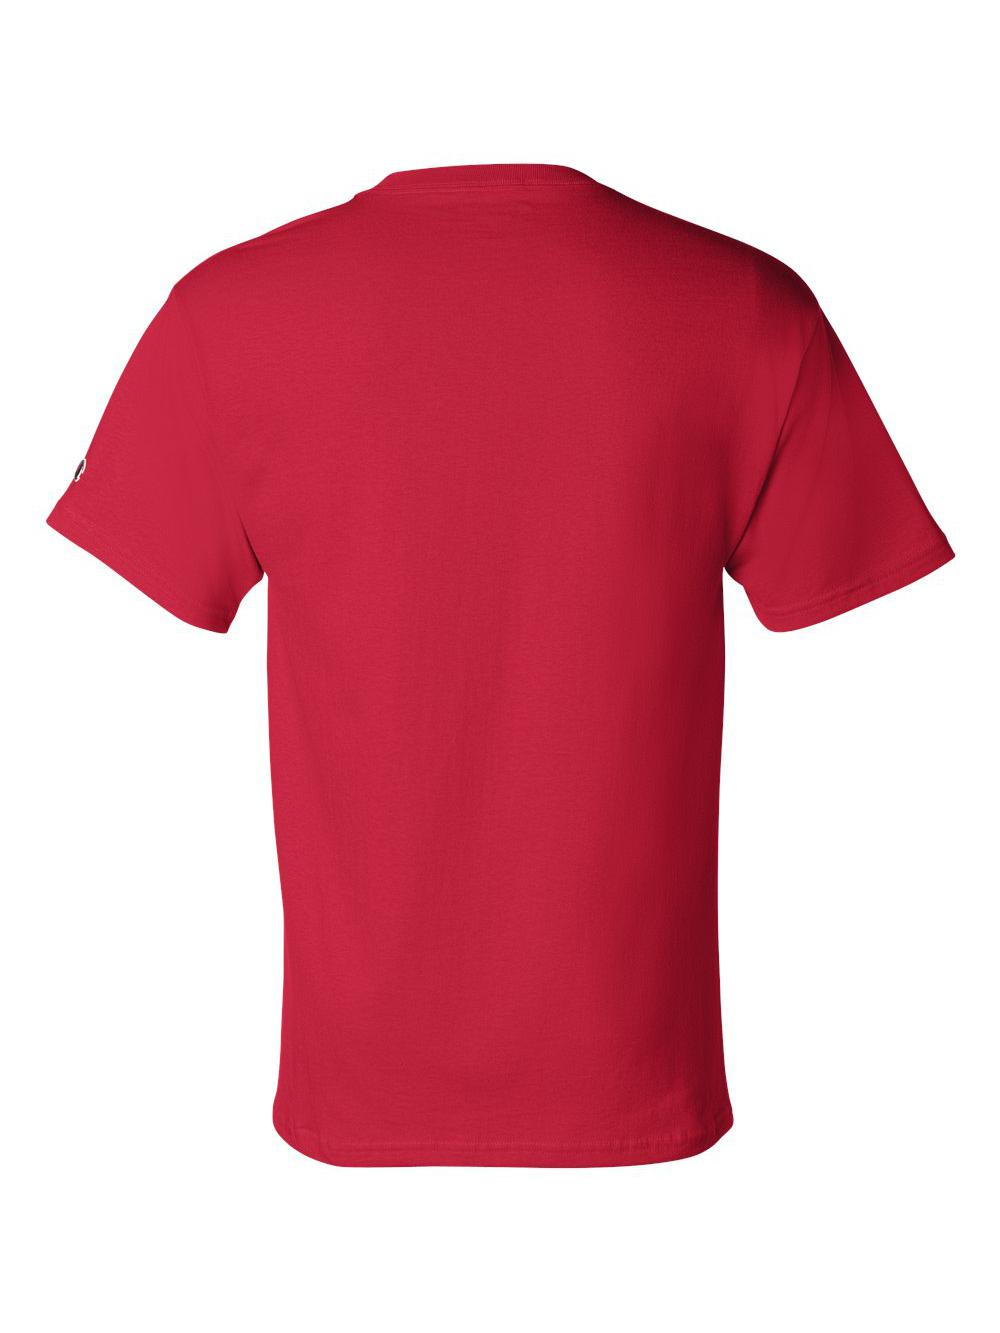 Champion-Short-Sleeve-T-Shirt-T425 thumbnail 25